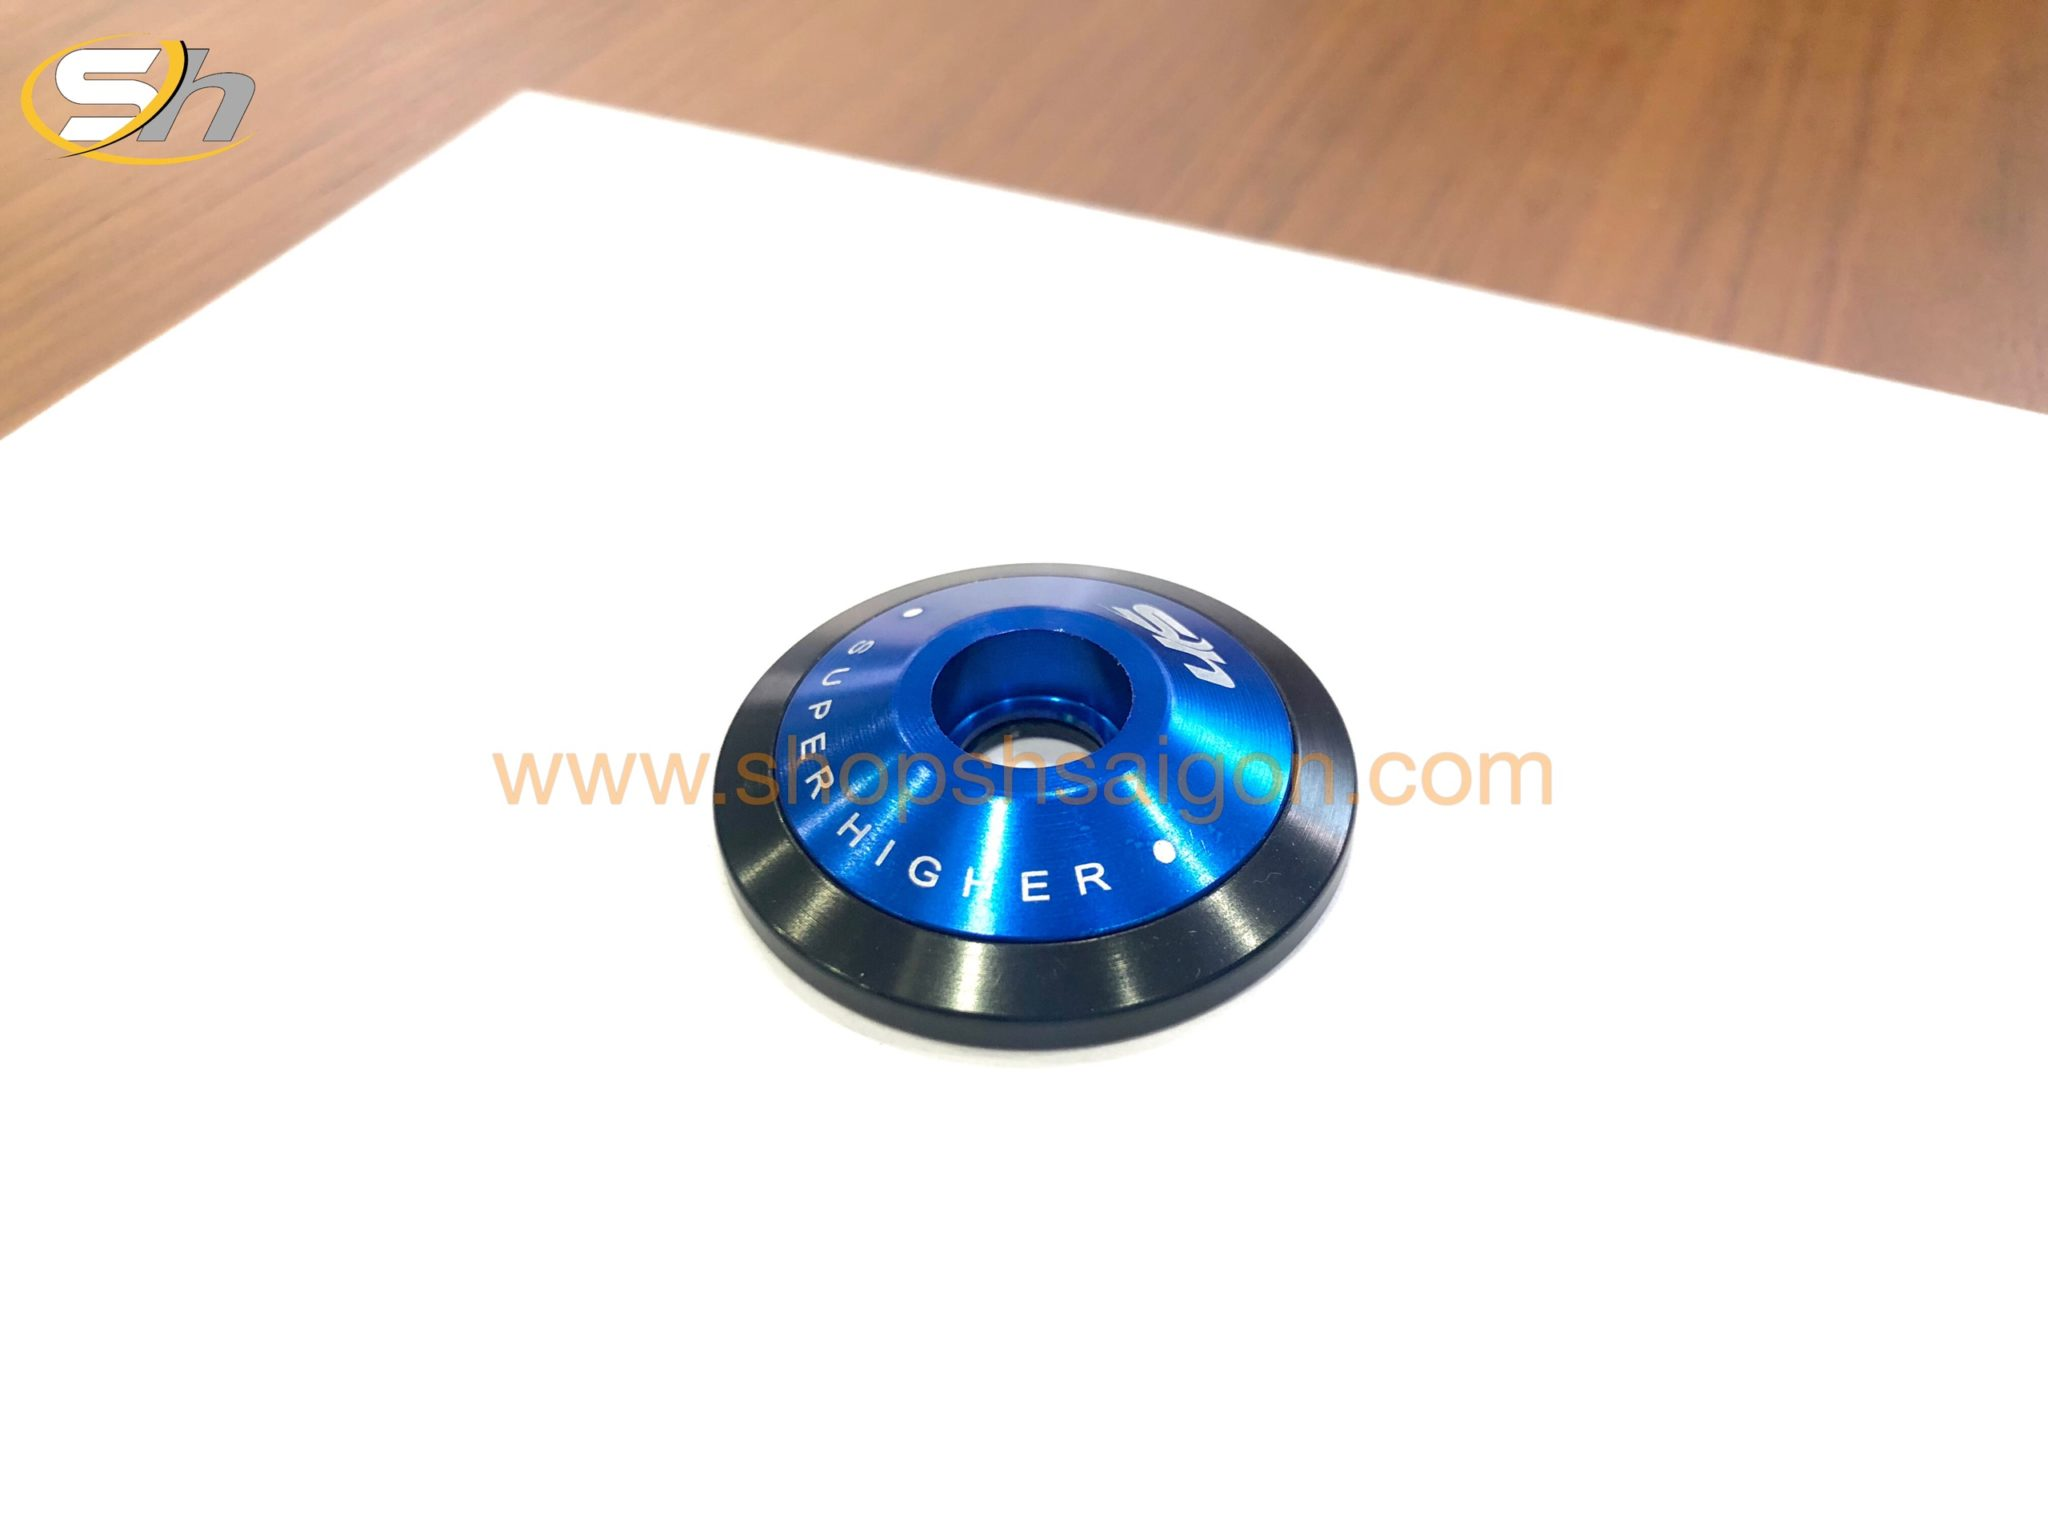 shopshsaigon com bit guong 2 lop super higher 2 - Nút Bịt Gương 2 Lớp Cao Cấp Super Higher